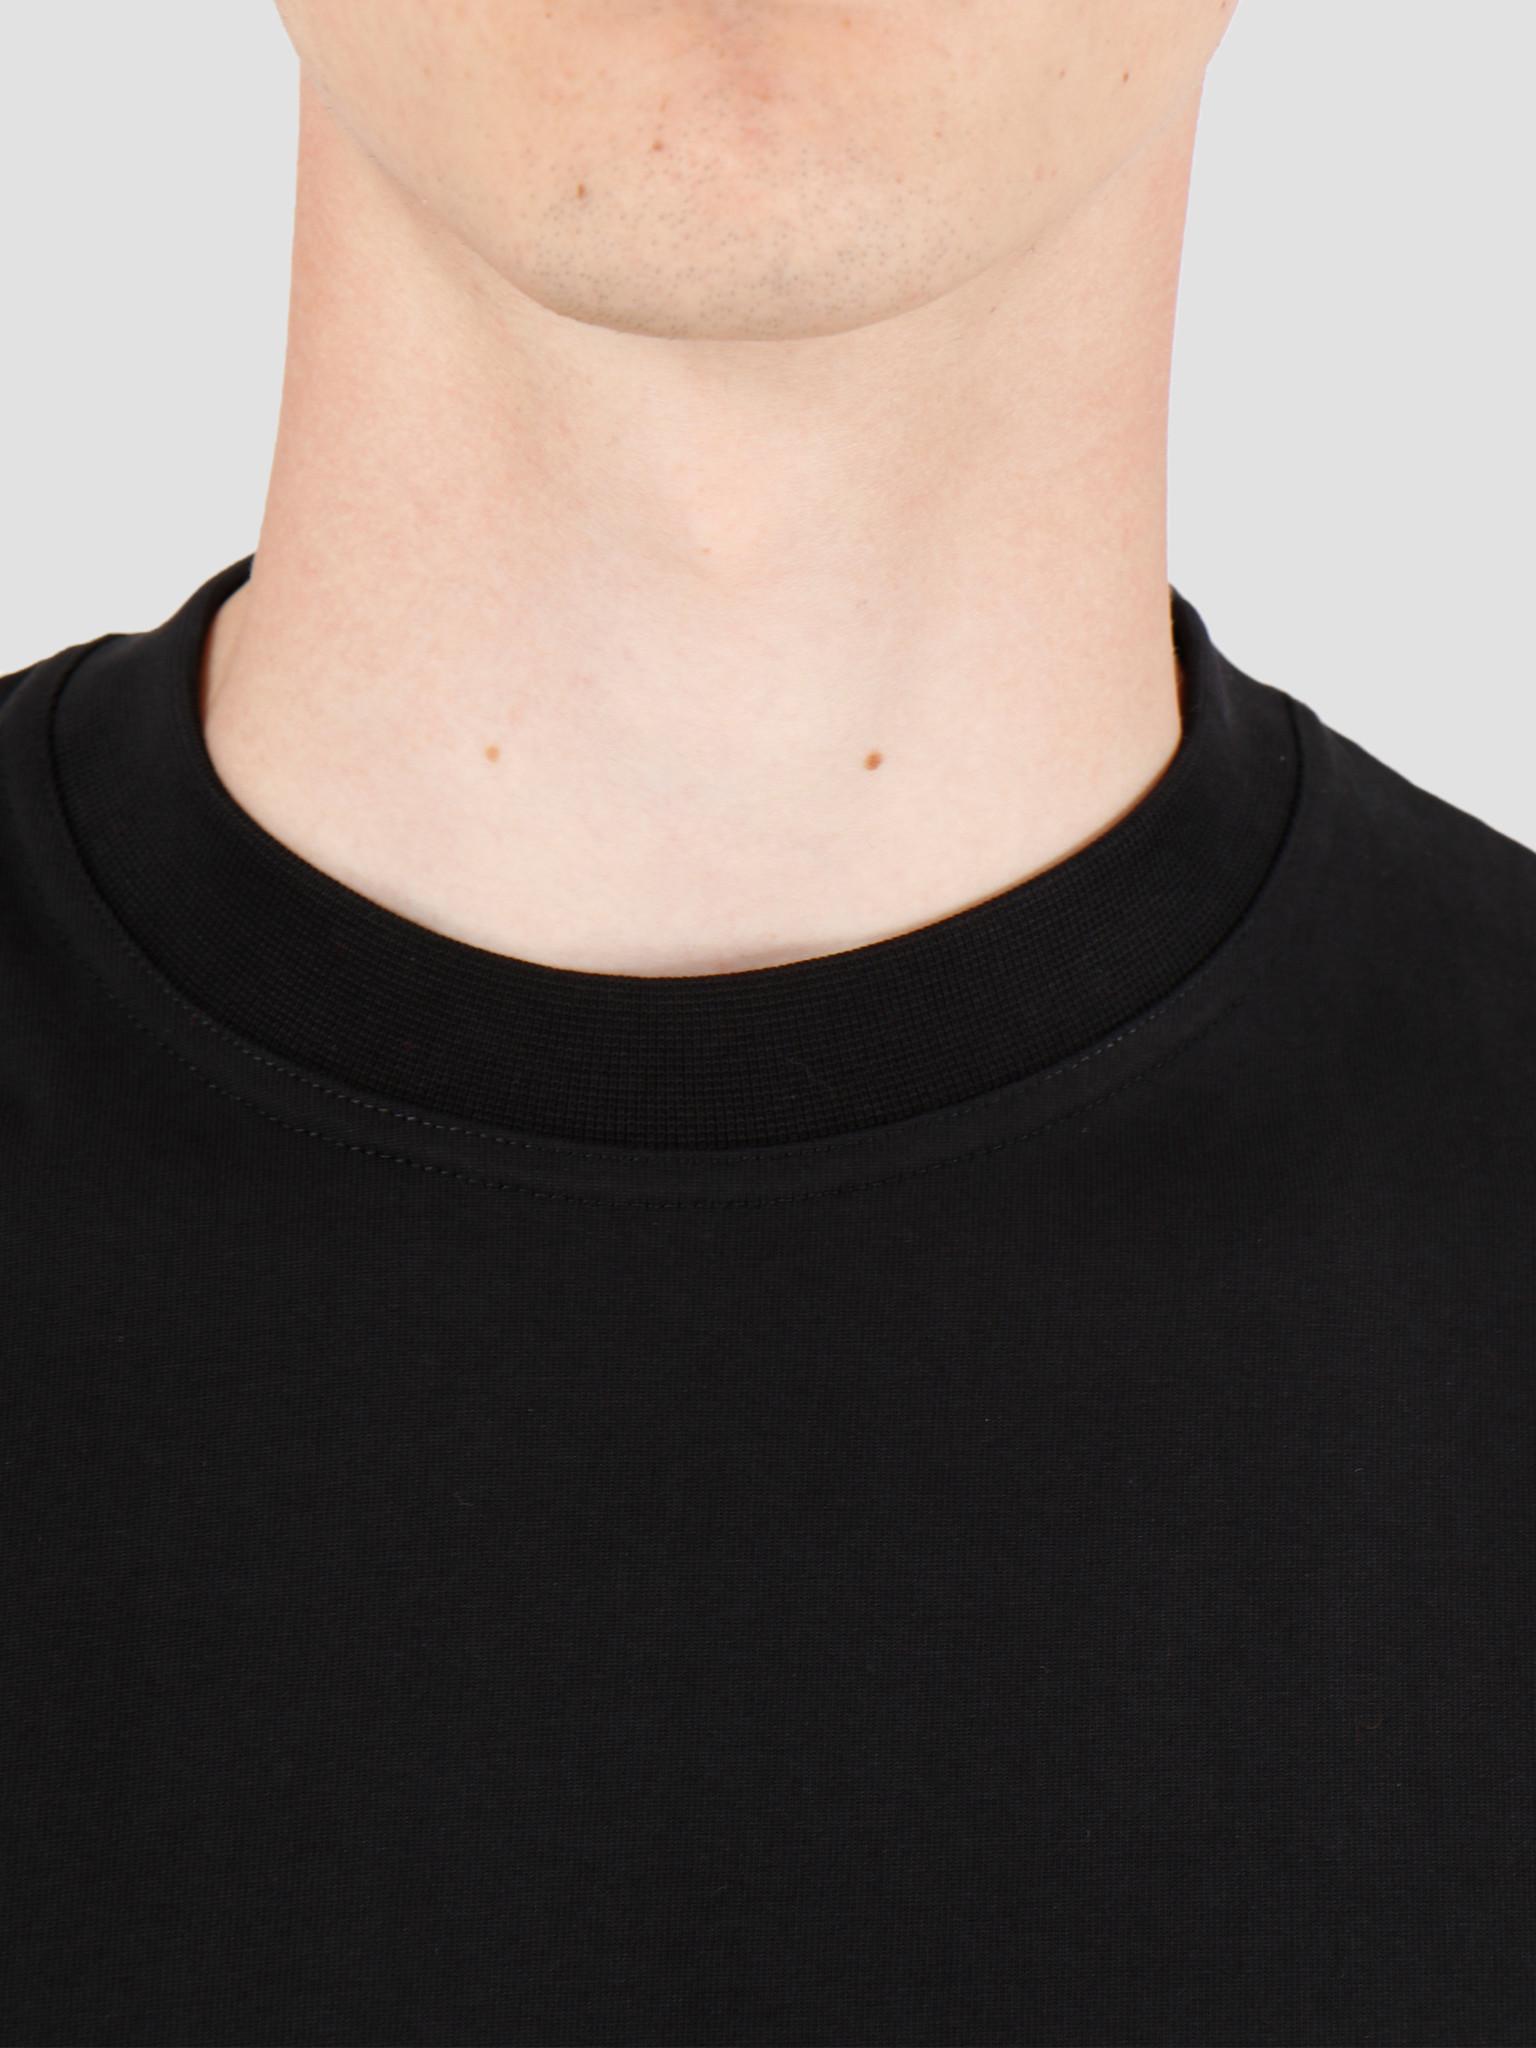 Arte Antwerp Arte Antwerp Tyler T-Shirt Black AW19-048